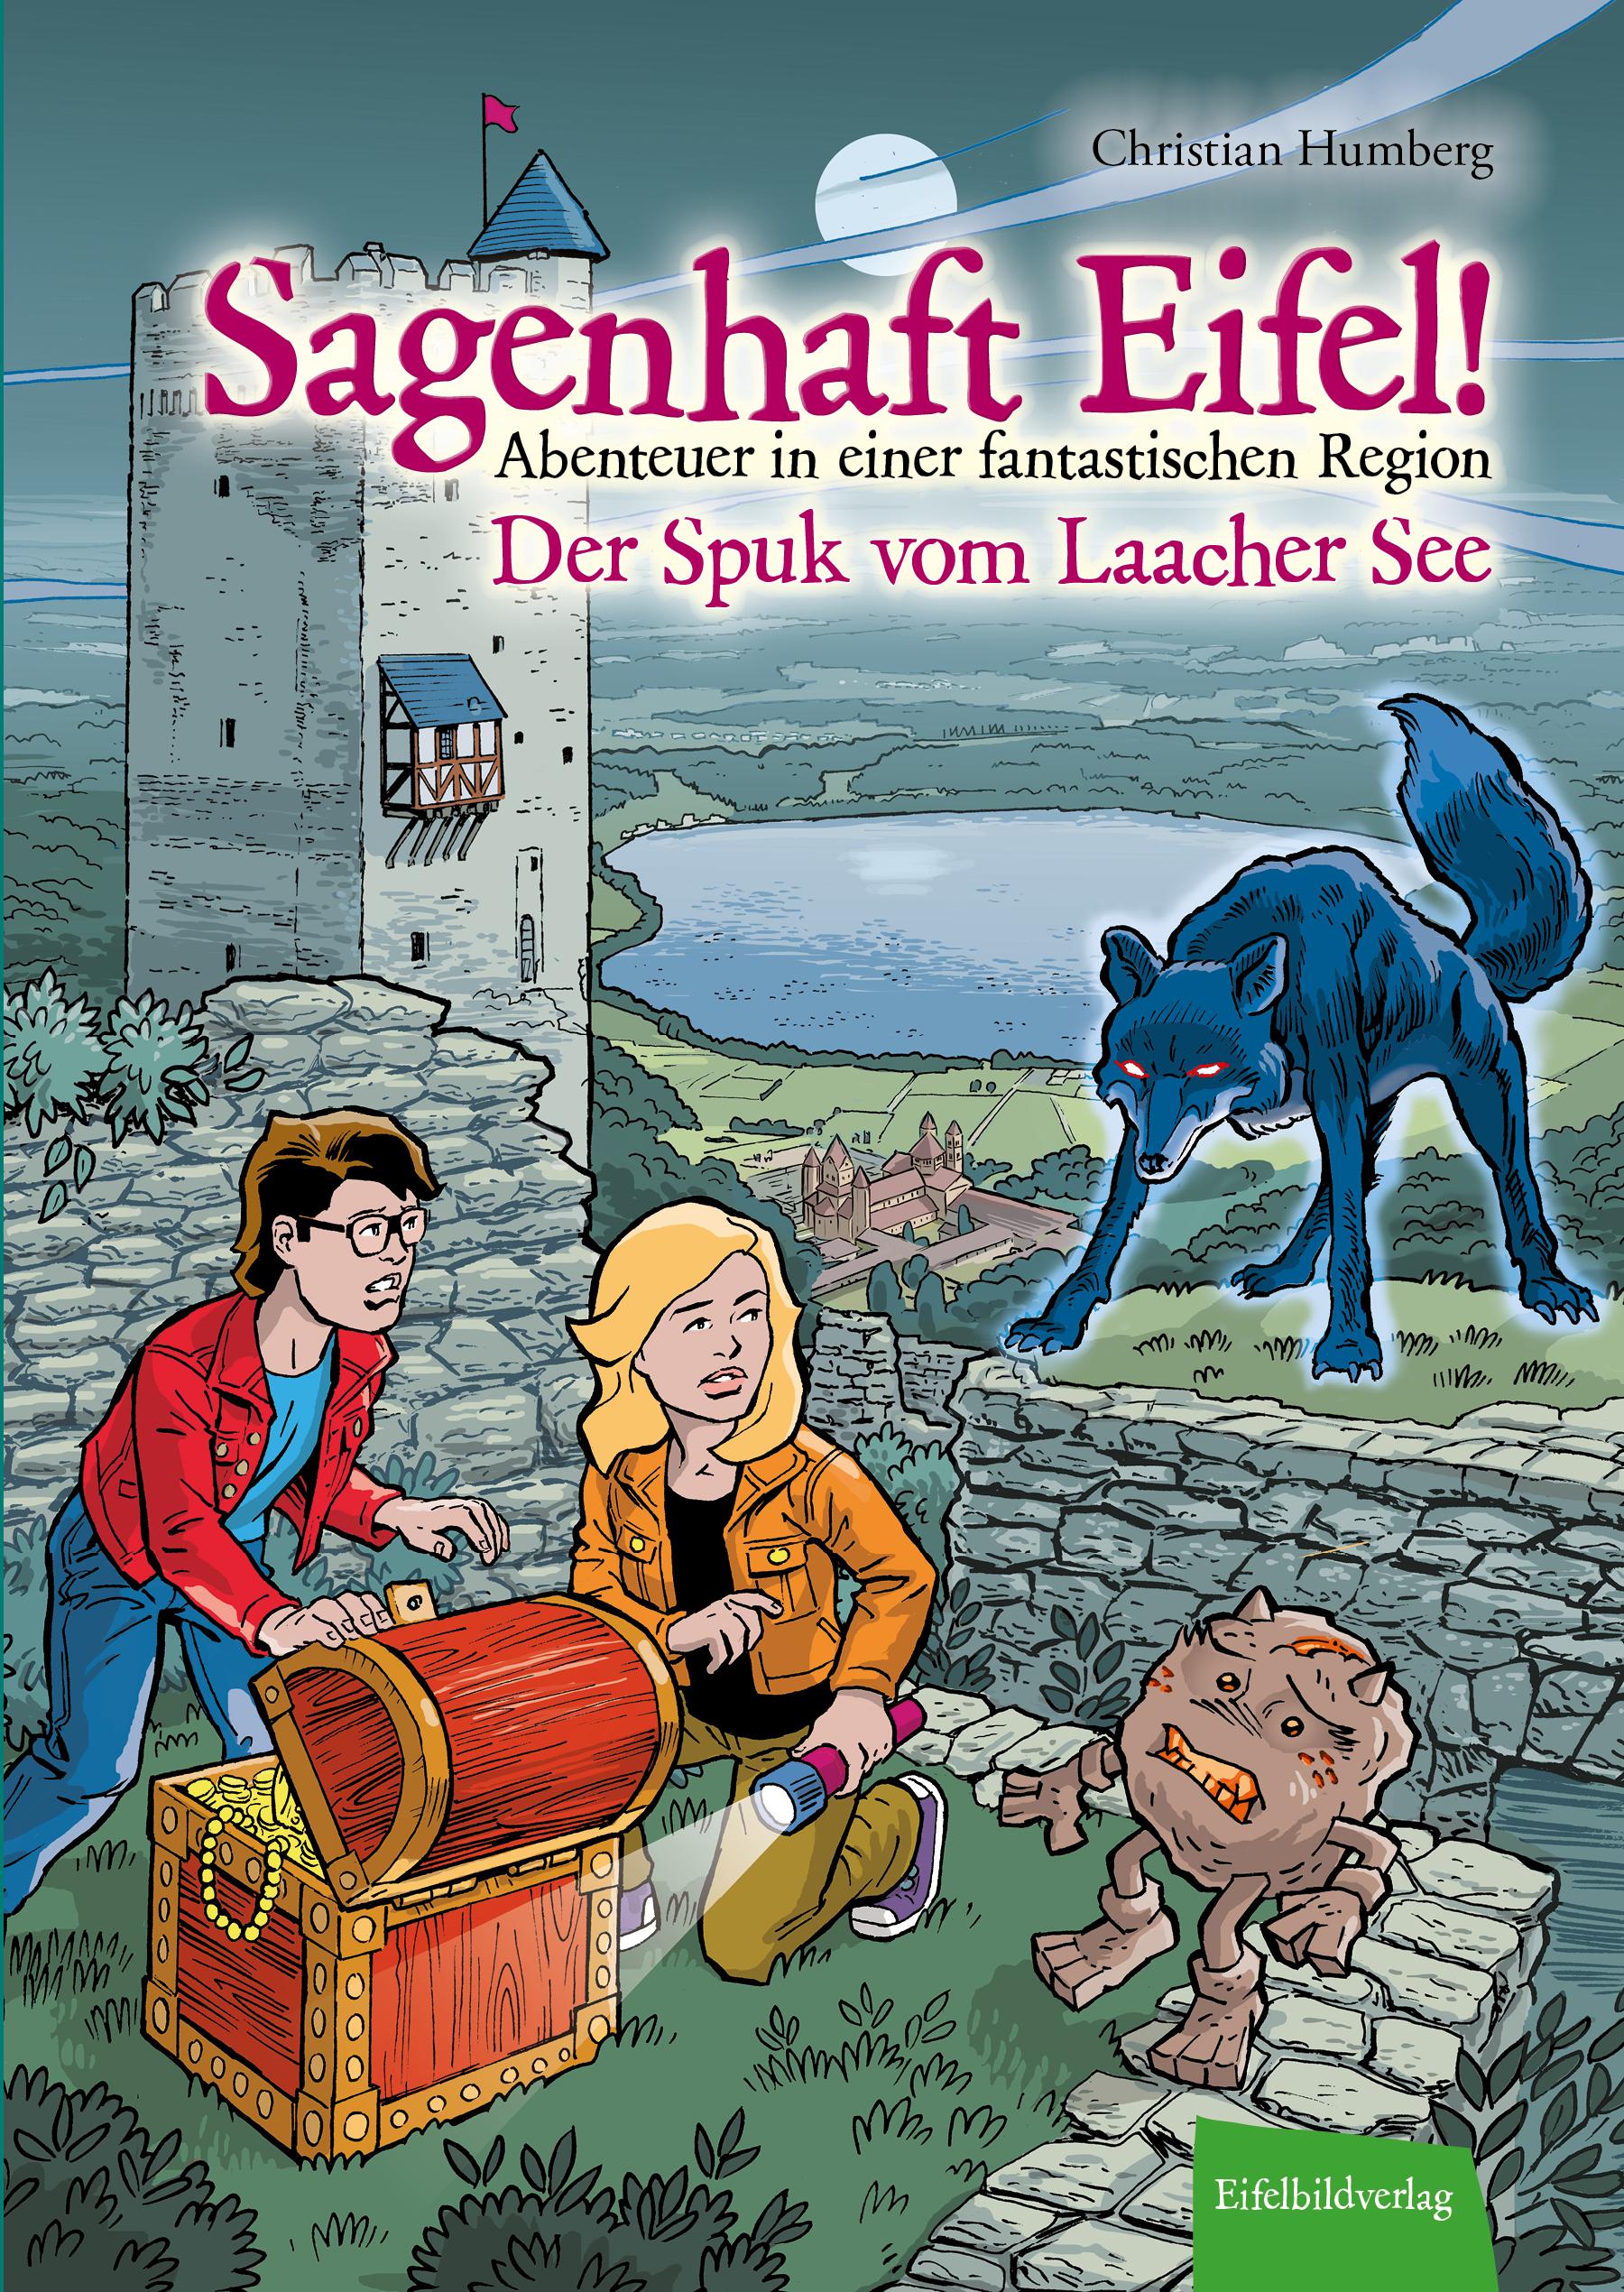 Symbool Van Het Merk Sagenhaft Eifel! - Abenteuer In Einer Fantastischen Region - 9783946328346